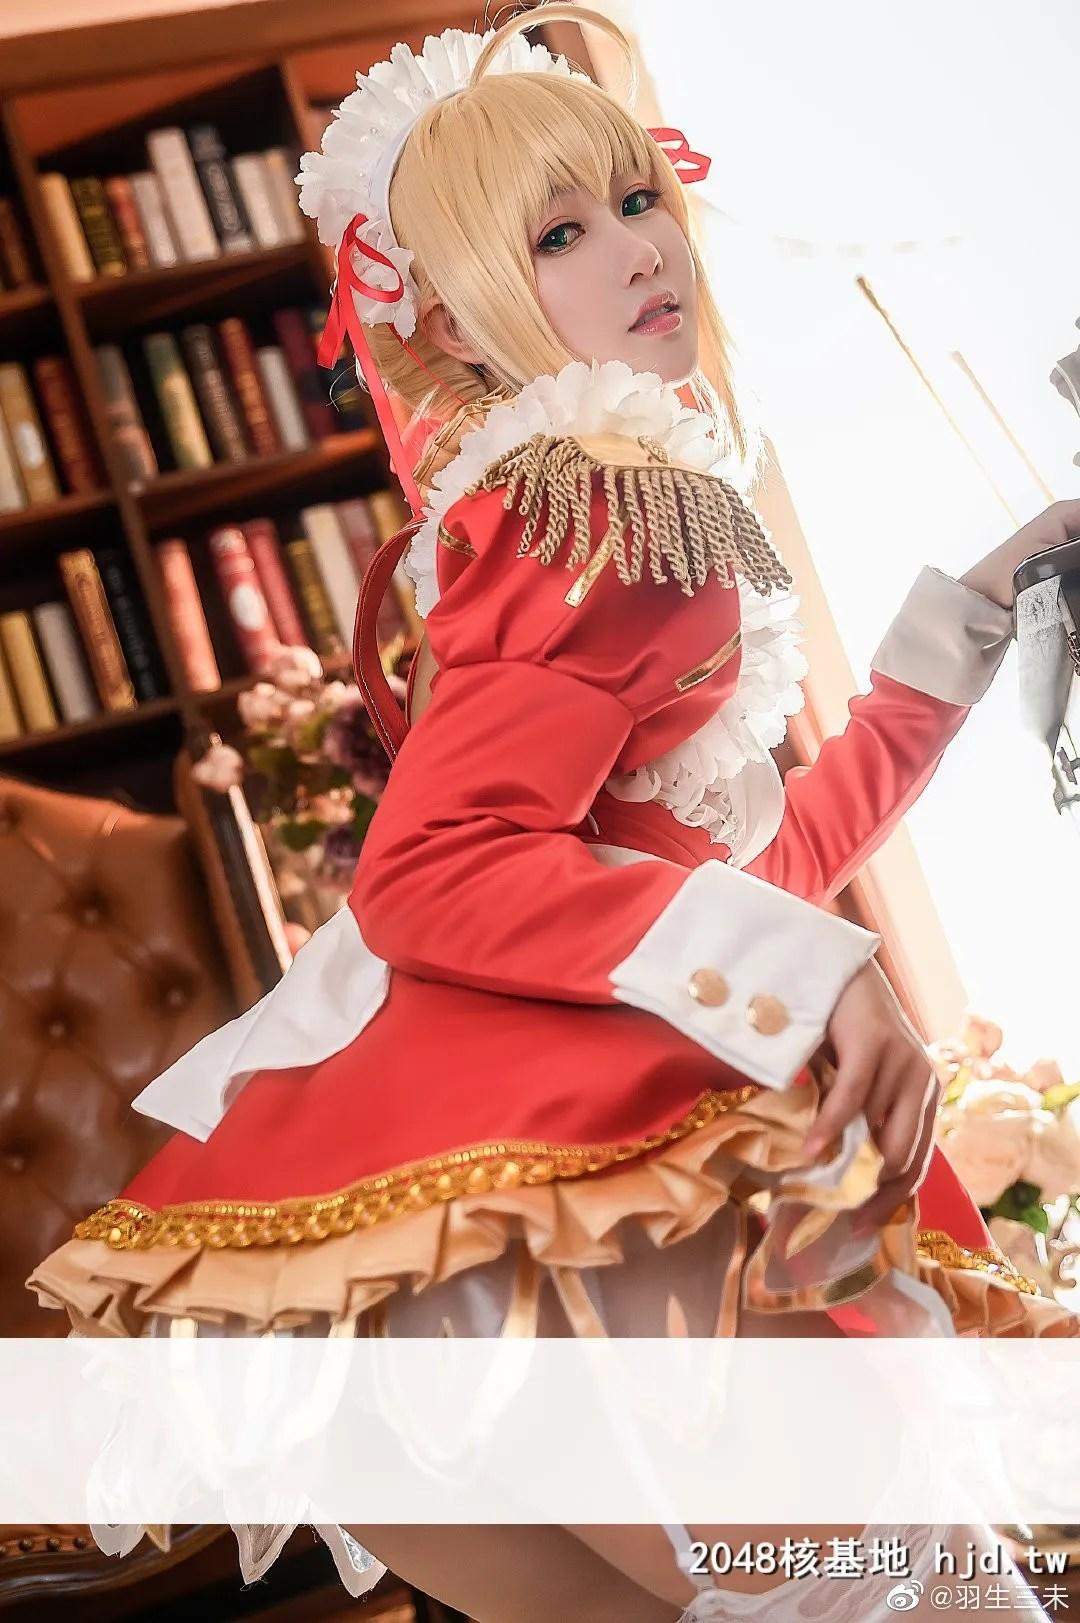 Fate/GrandOrder尼禄·克劳狄乌斯 同人女仆@羽生三未 (9P)插图(5)